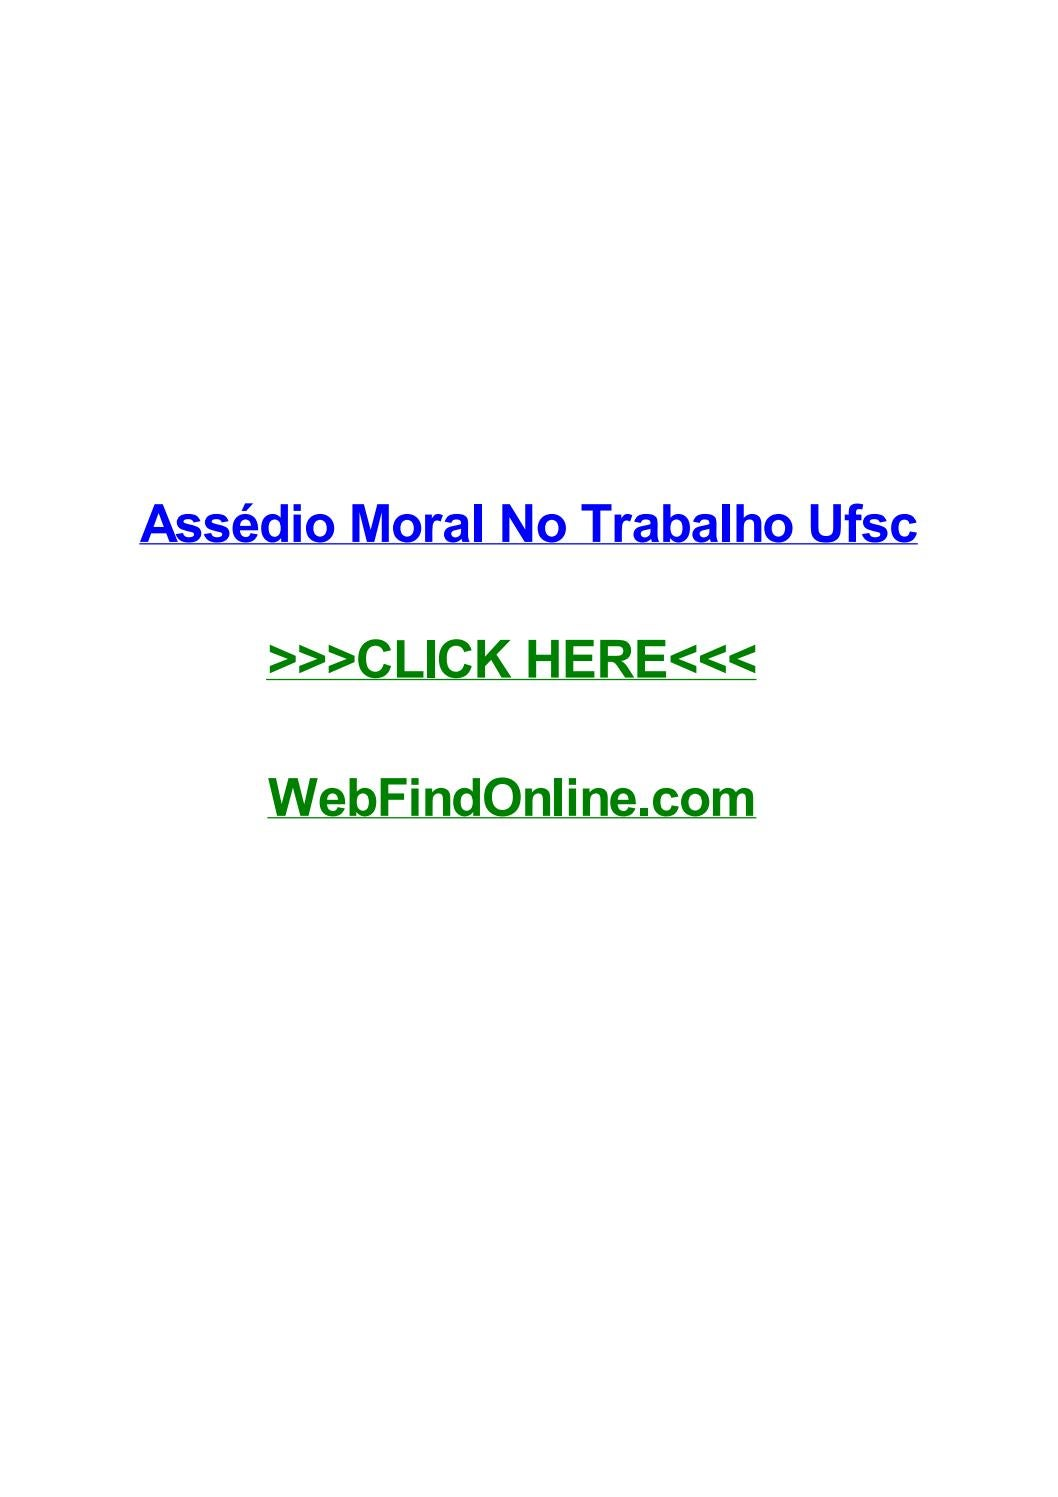 Assг Dio Moral No Trabalho Ufsc By Johncuzr Issuu